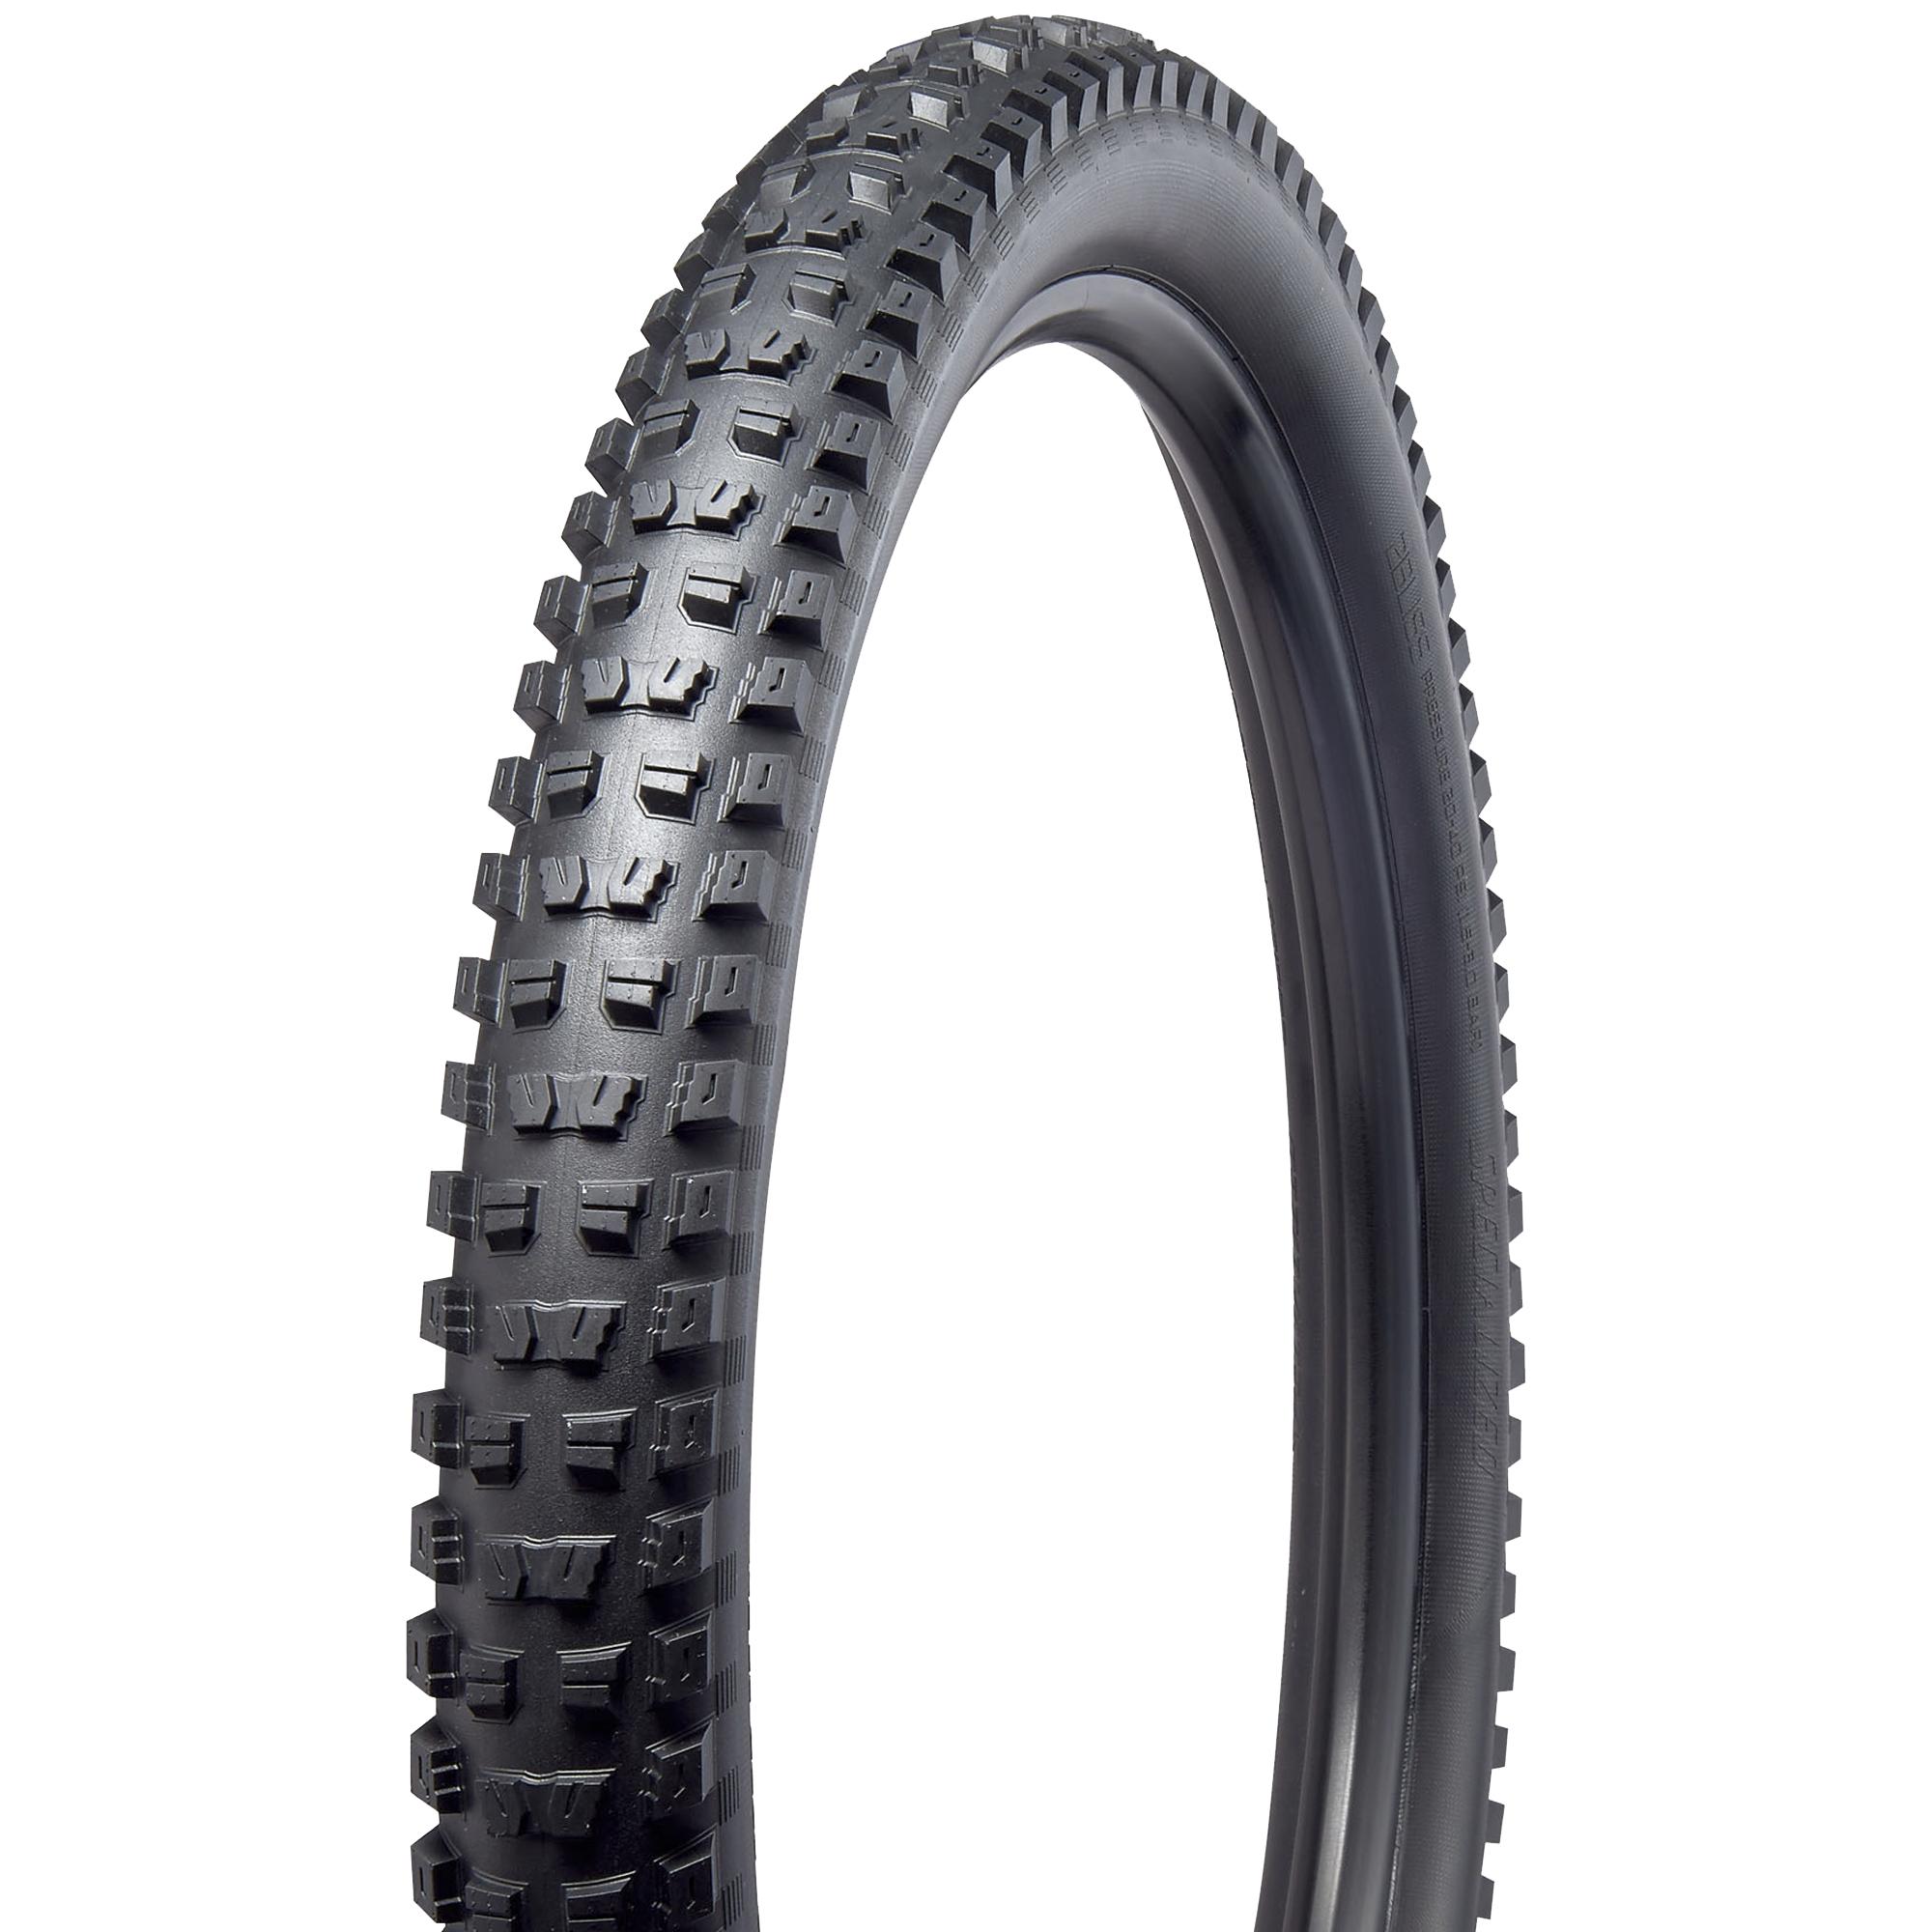 Kenda Nevegal2 Tire 29 x 2.40 Pro EN-DTC ATC 120tpi Folding Bead